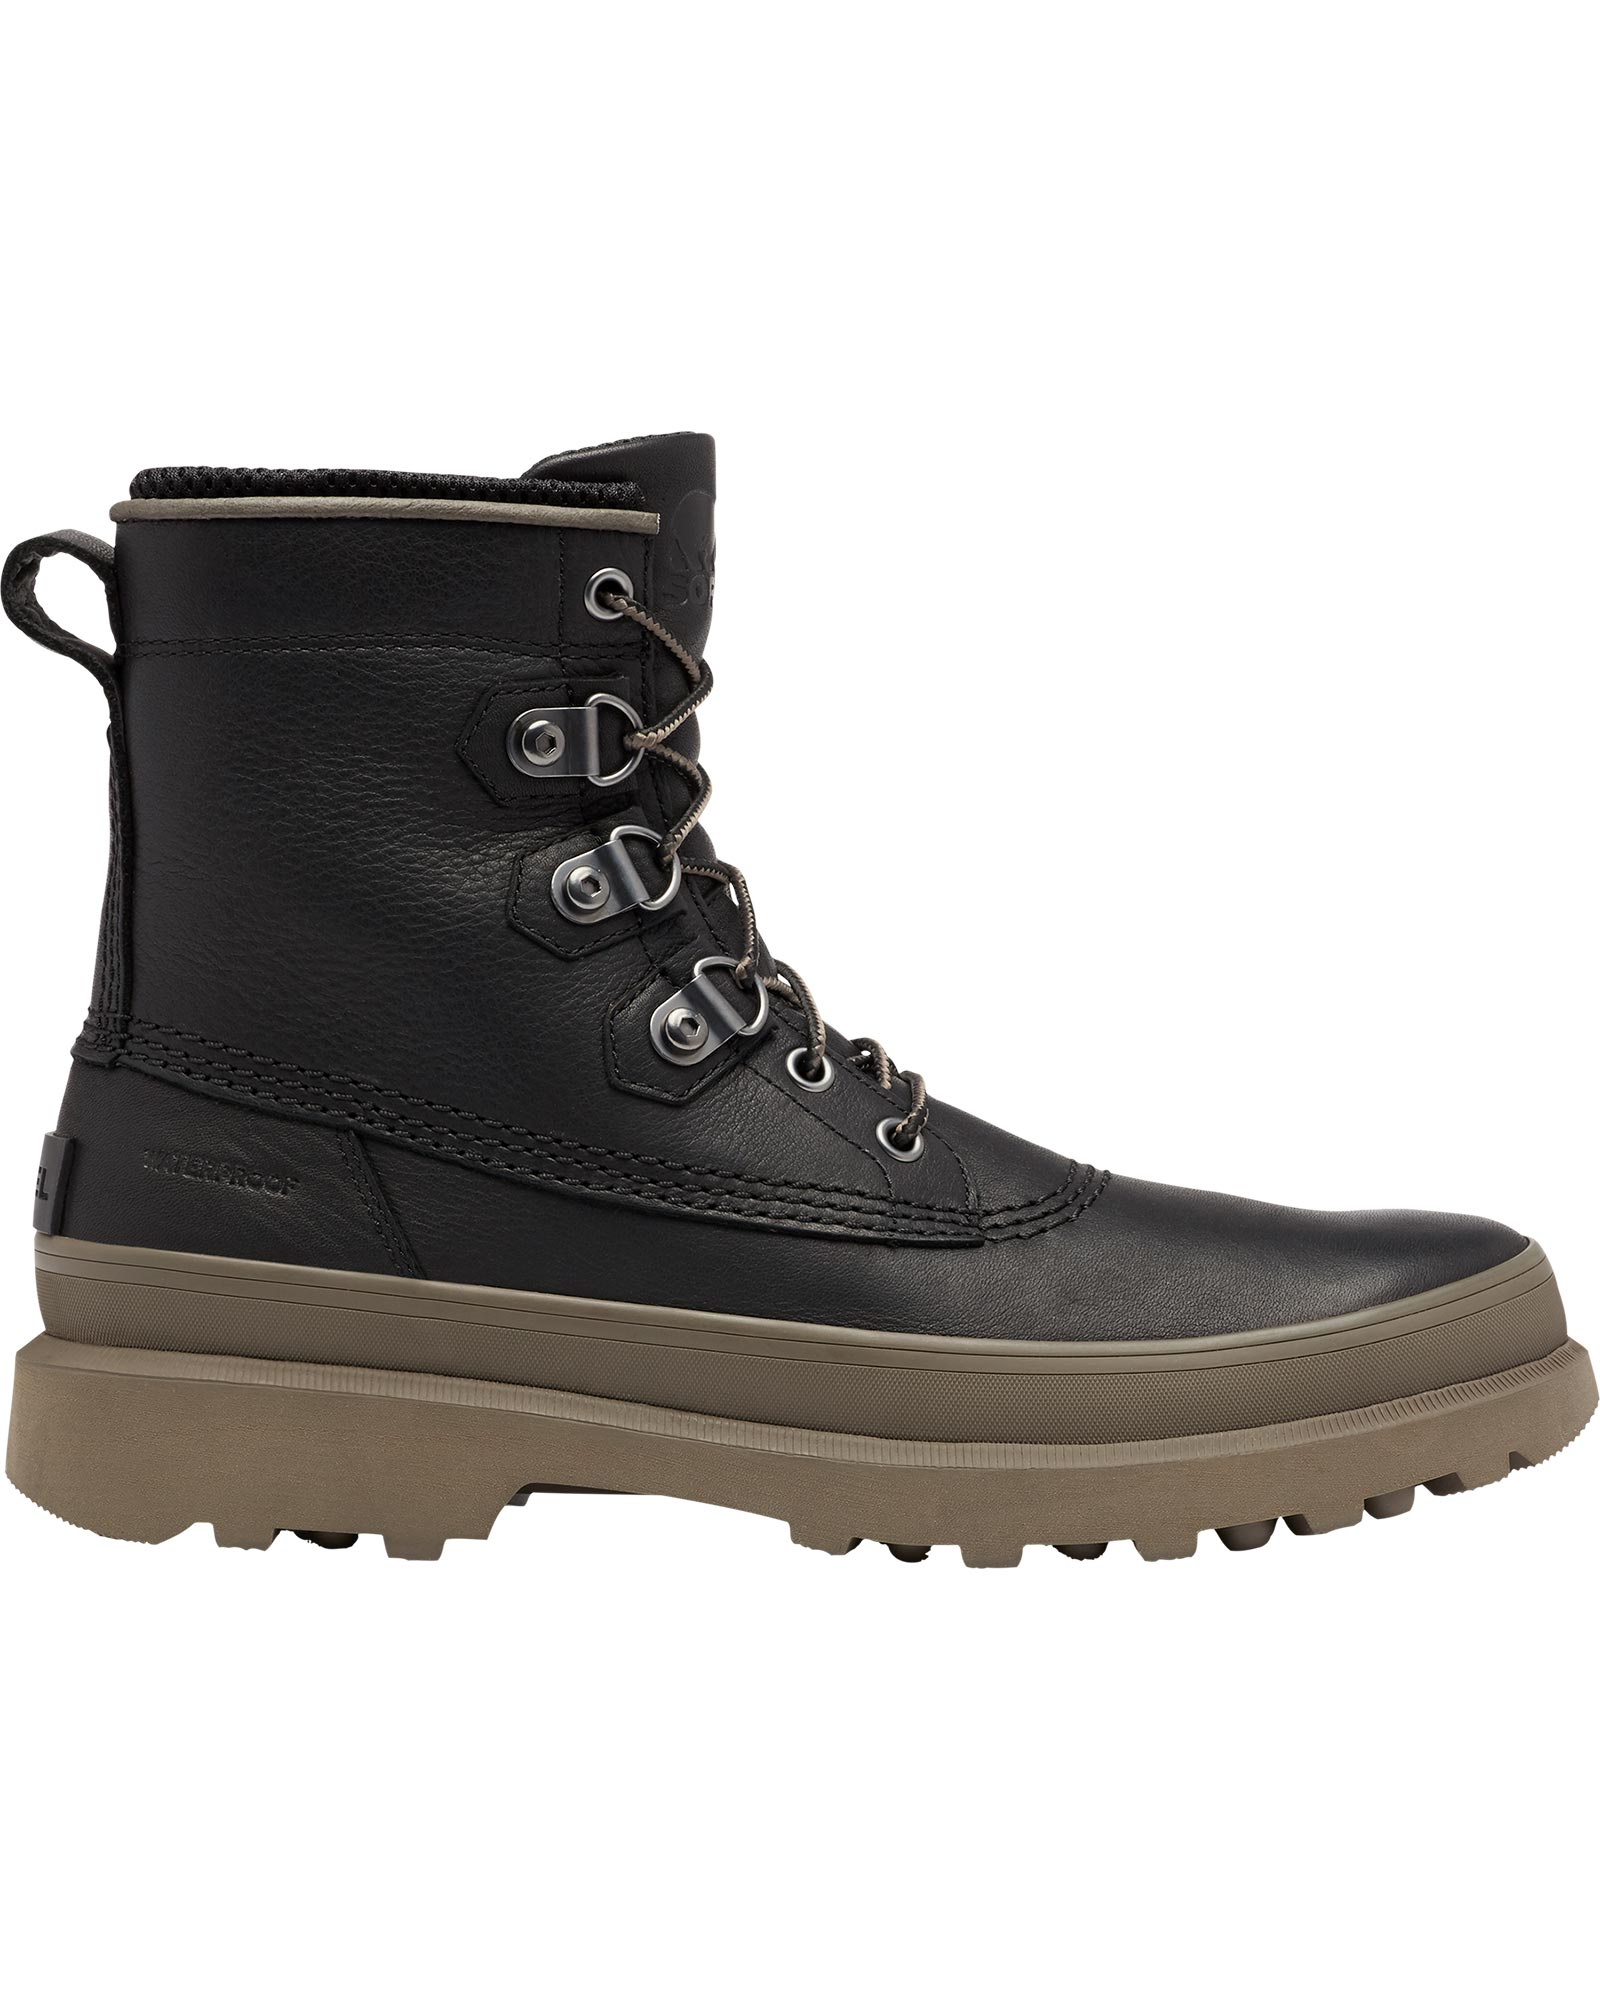 Sorel Mens 1964 Pac Nylon Snow Boots